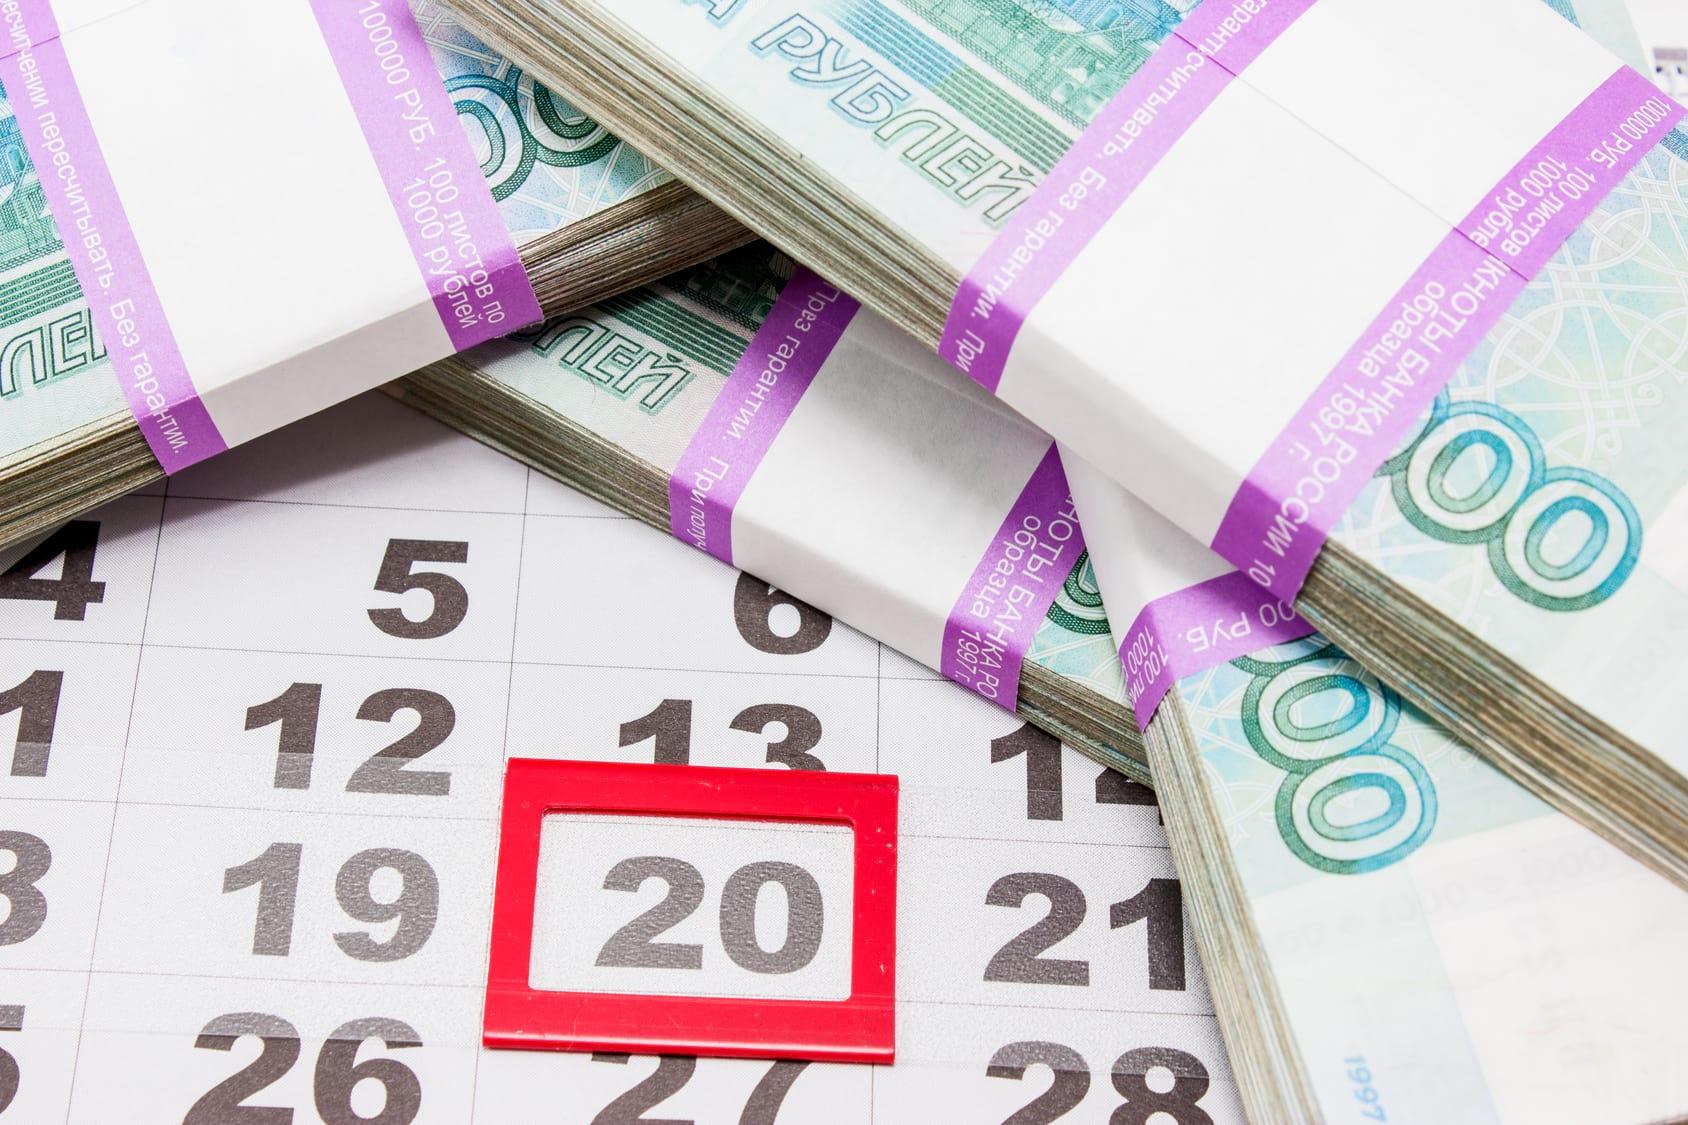 Изображение - Оплата налога на имущество, если квартира находится в ипотеке wsi-imageoptim-dengi